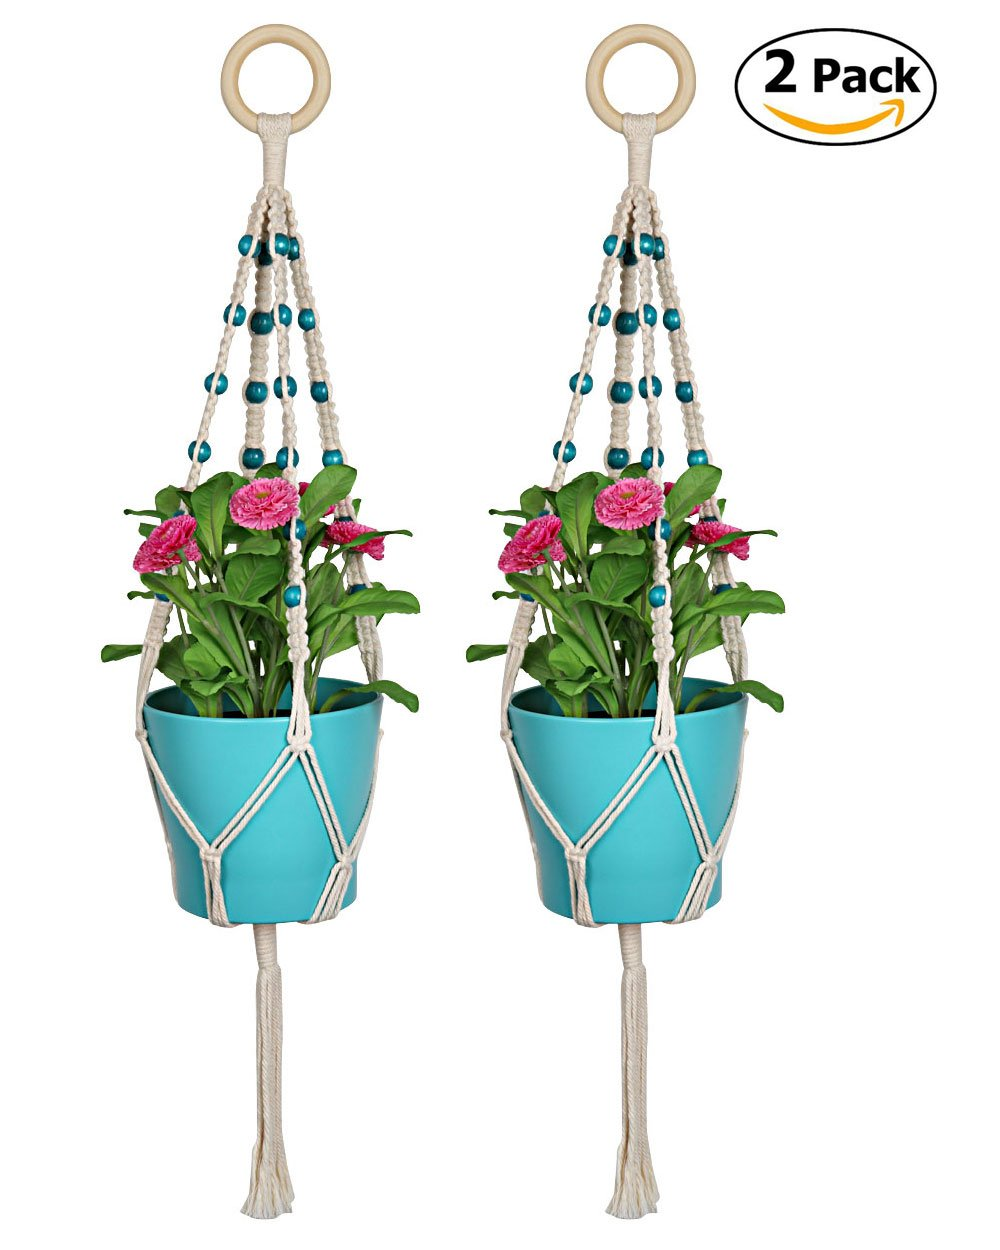 Macrame Plant Hanger, Seavish 2 Pack Hanging Plant Indoor Outdoor Plant Holder Basket Cotton Rope 4 Legs Boho Chic Wall Decor for Garden Balcony Deck Patio Porch (30'') …